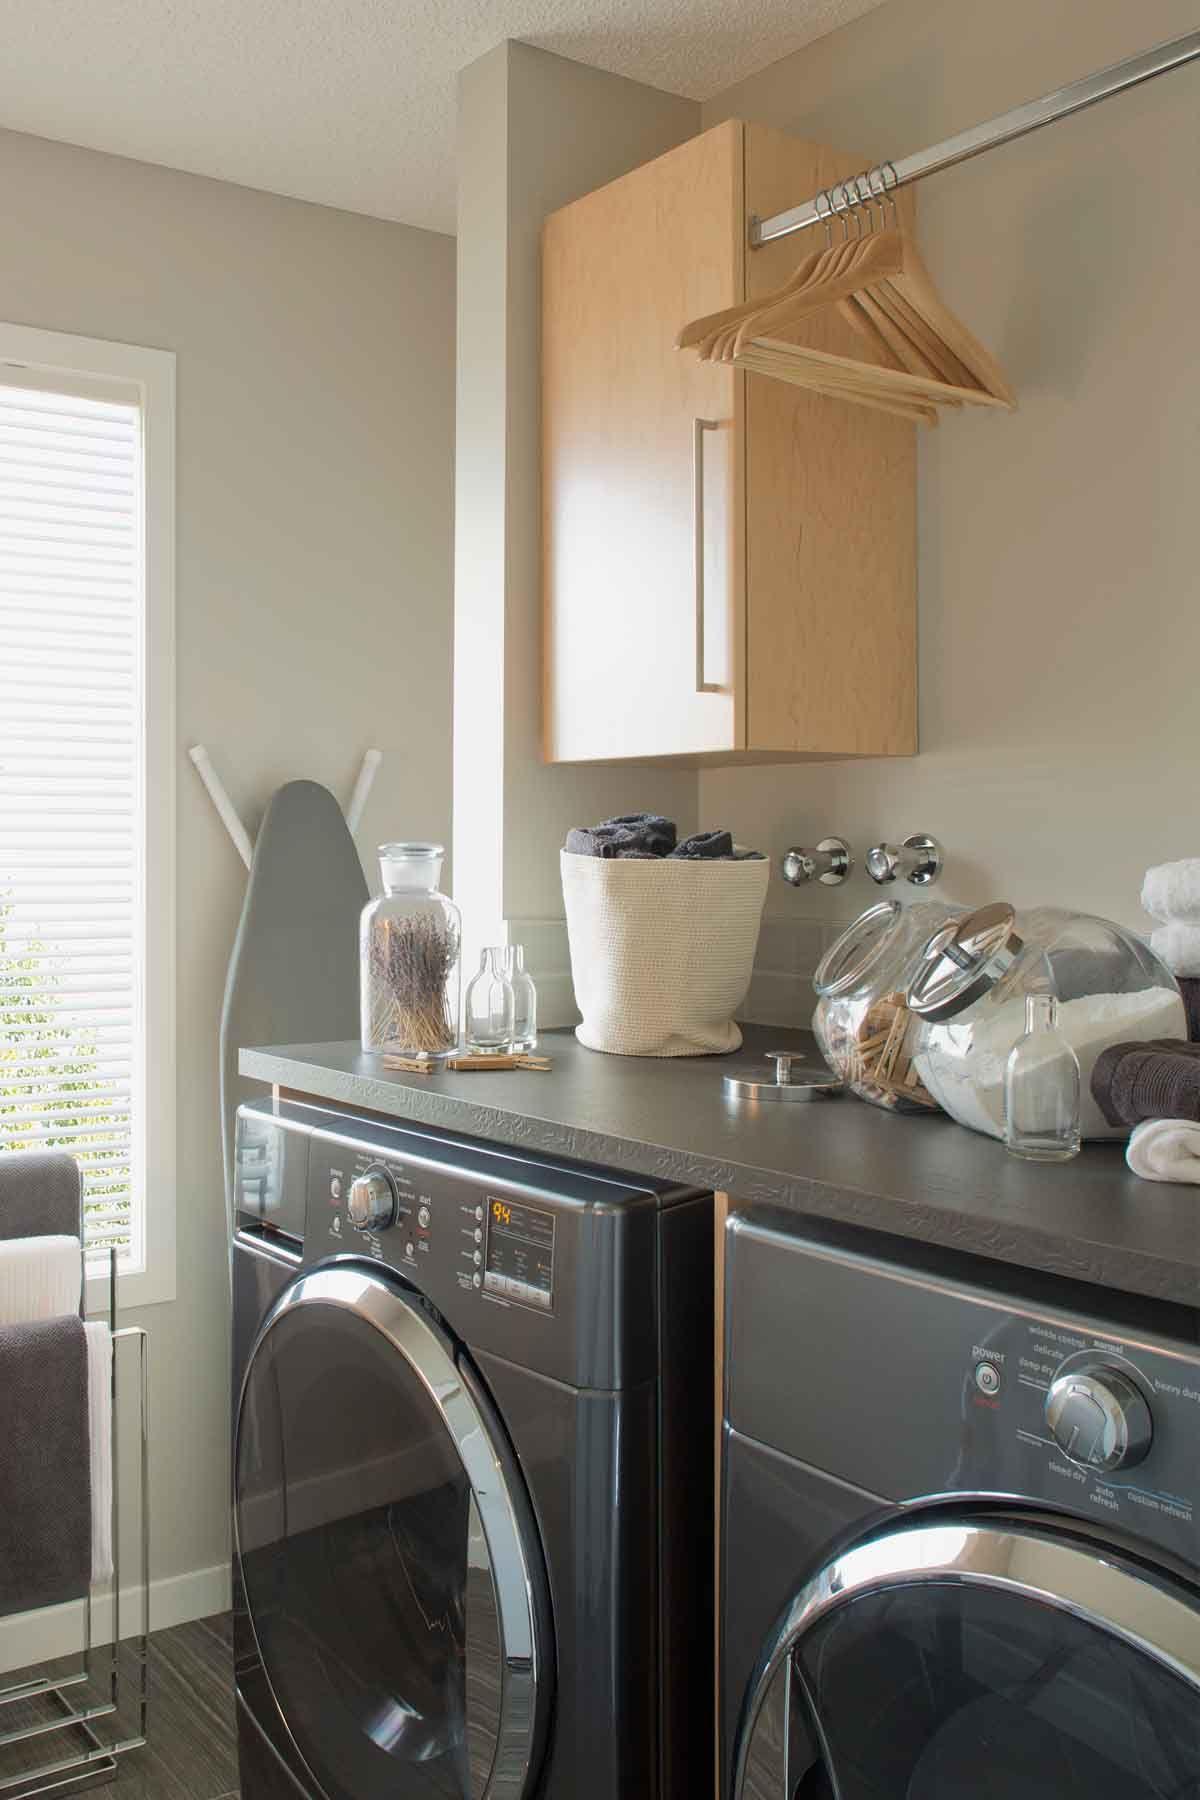 15 Laundry Room Storage and Organization Ideas - How To ... on Laundry Room Organization Ideas  id=74947